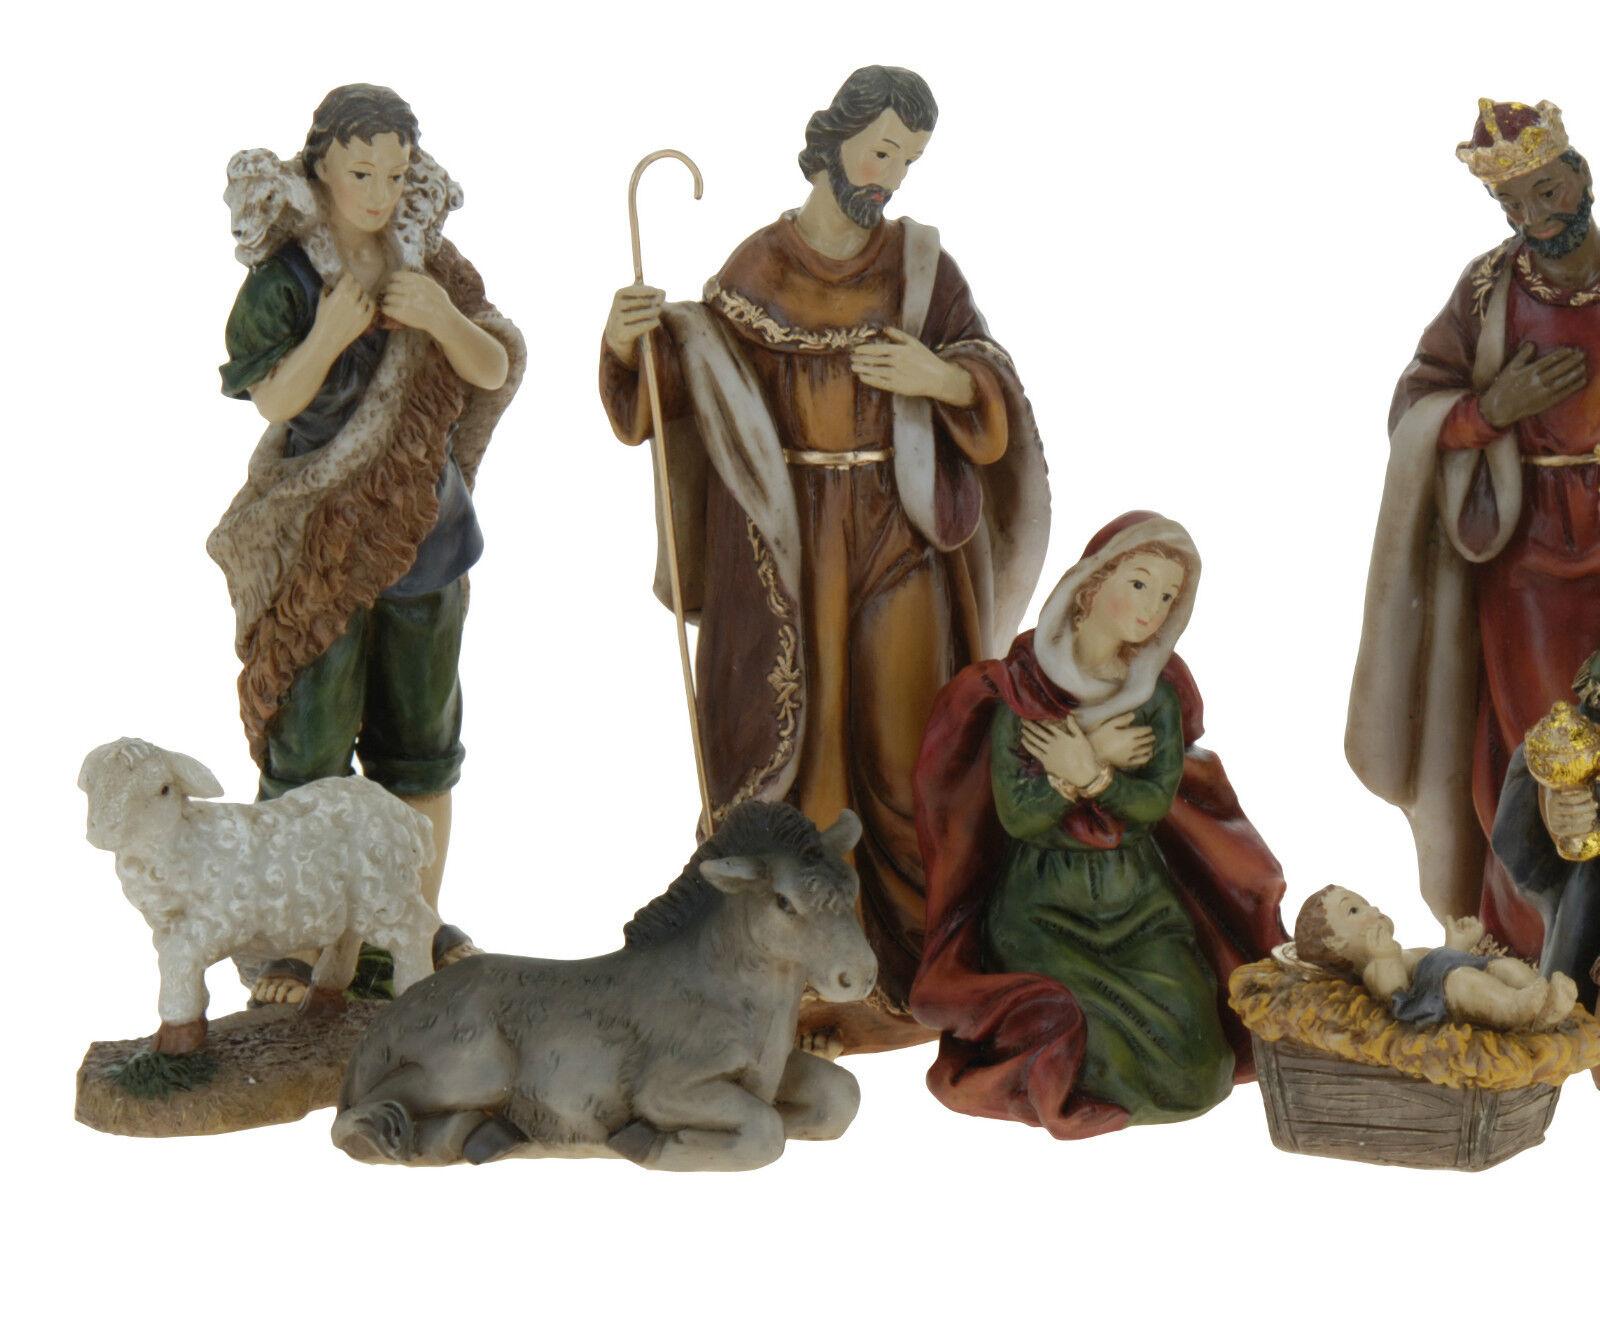 11 Piece Traditional Resin Christmas Nativity Figurine